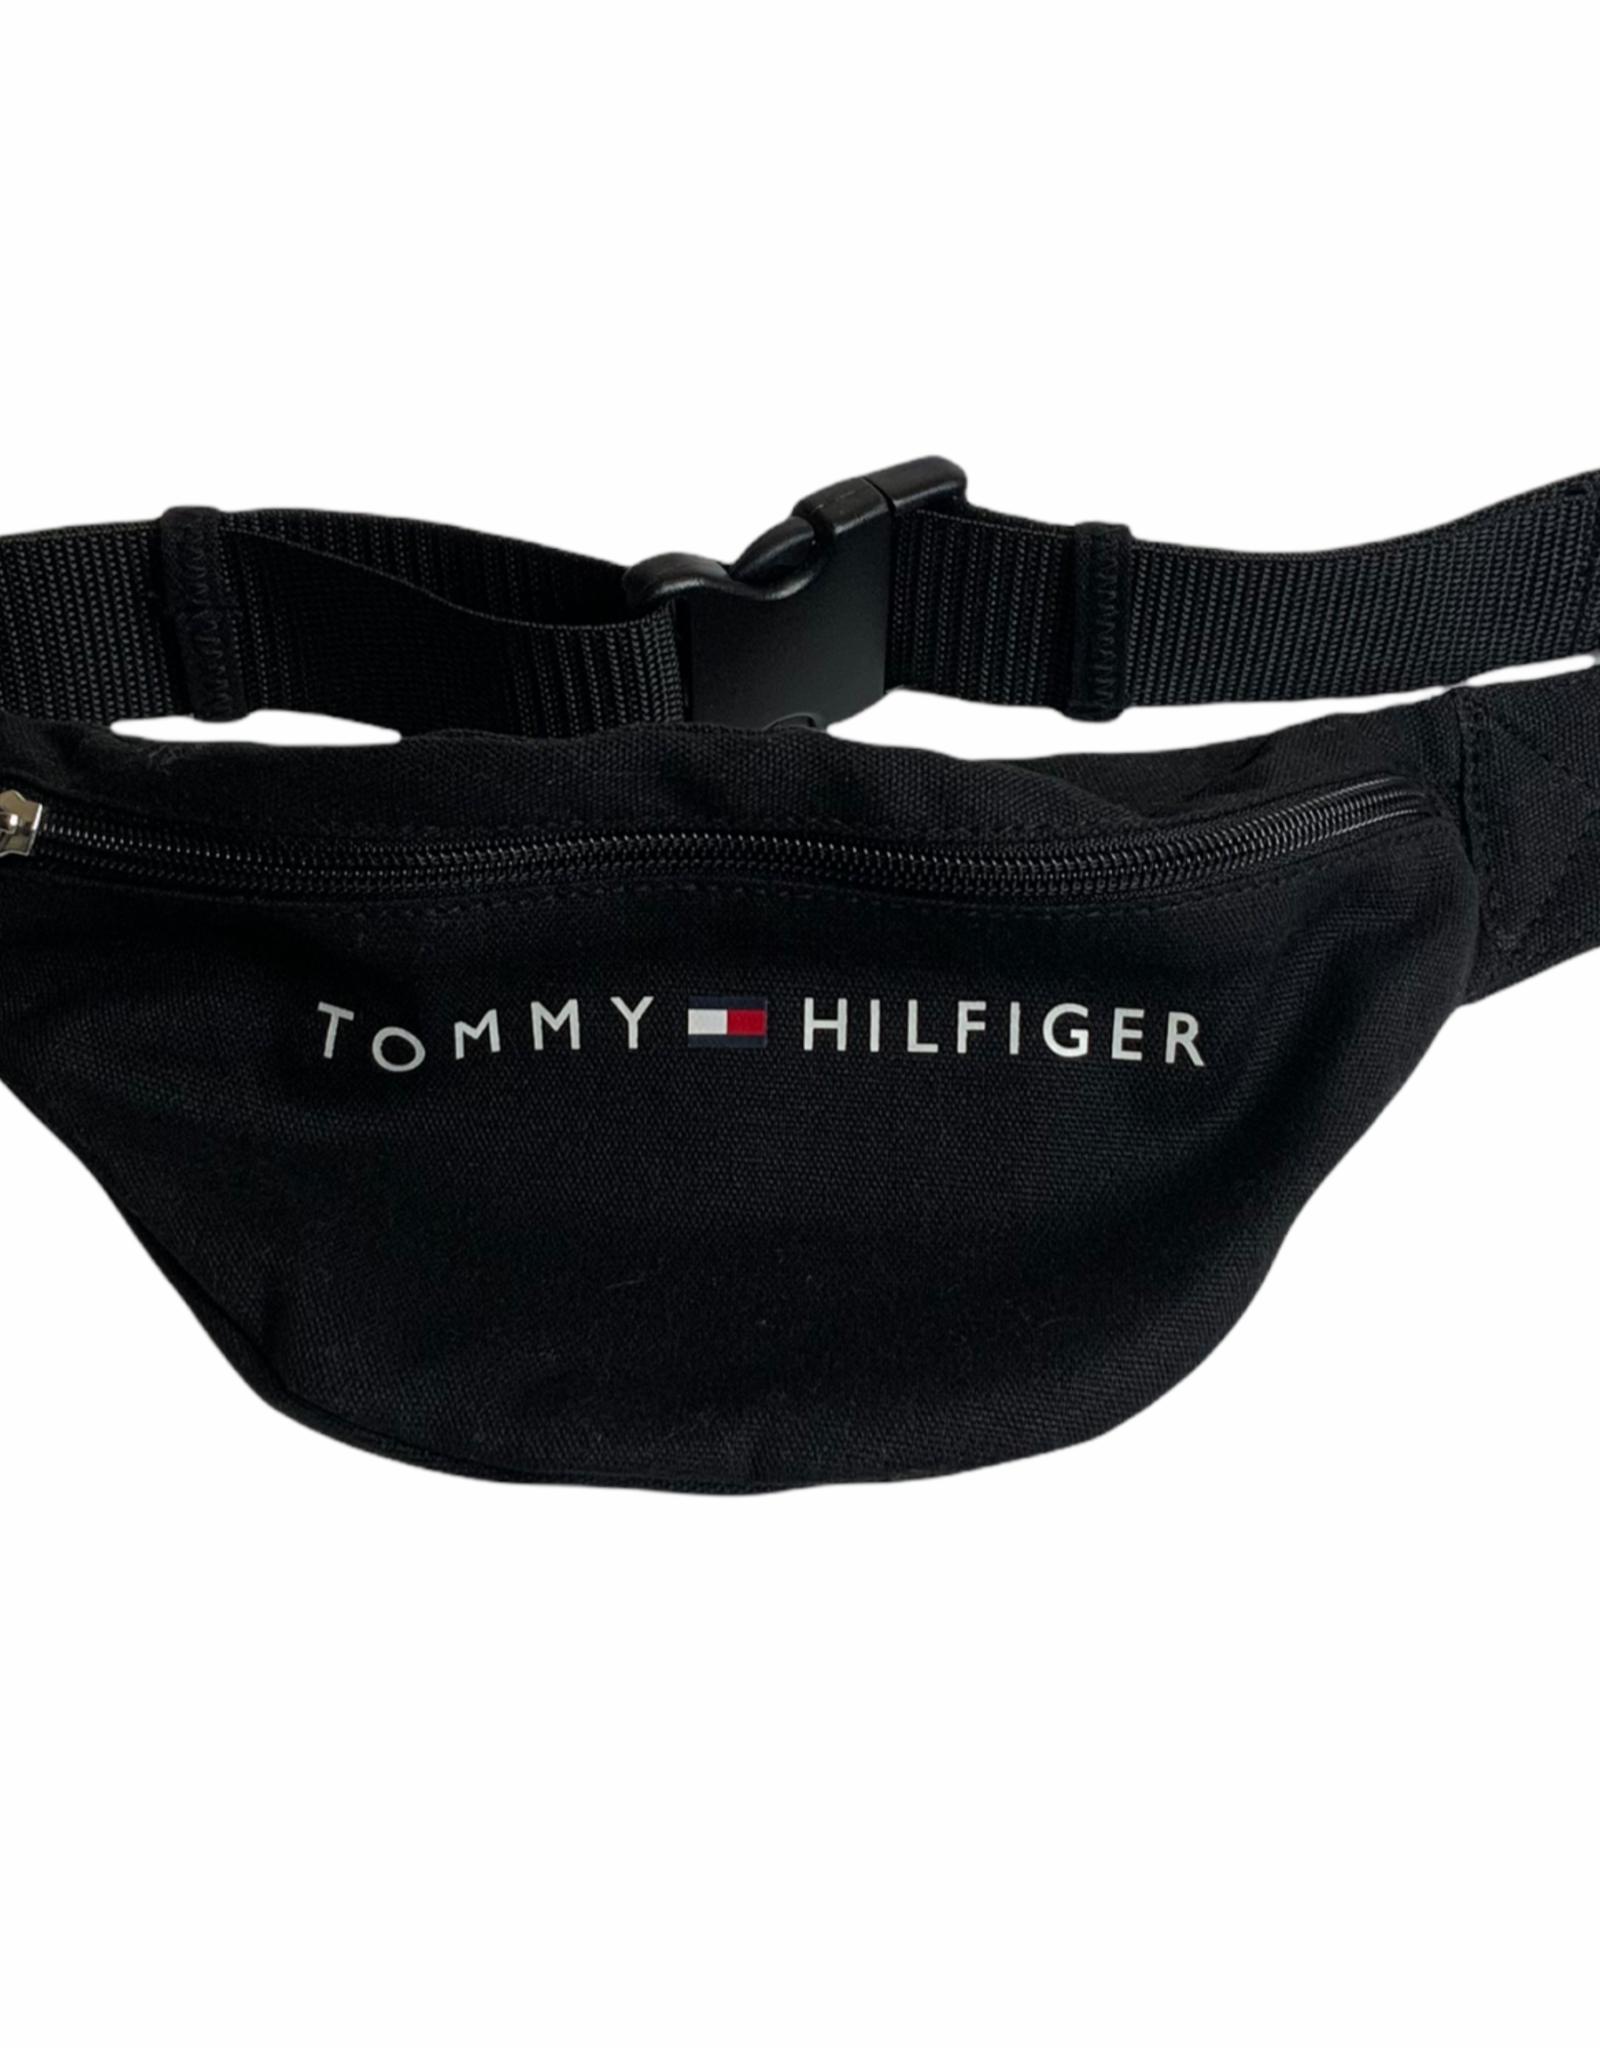 Tommy Hilfiger Tommy Hilfiger Jackson Fanny Pack